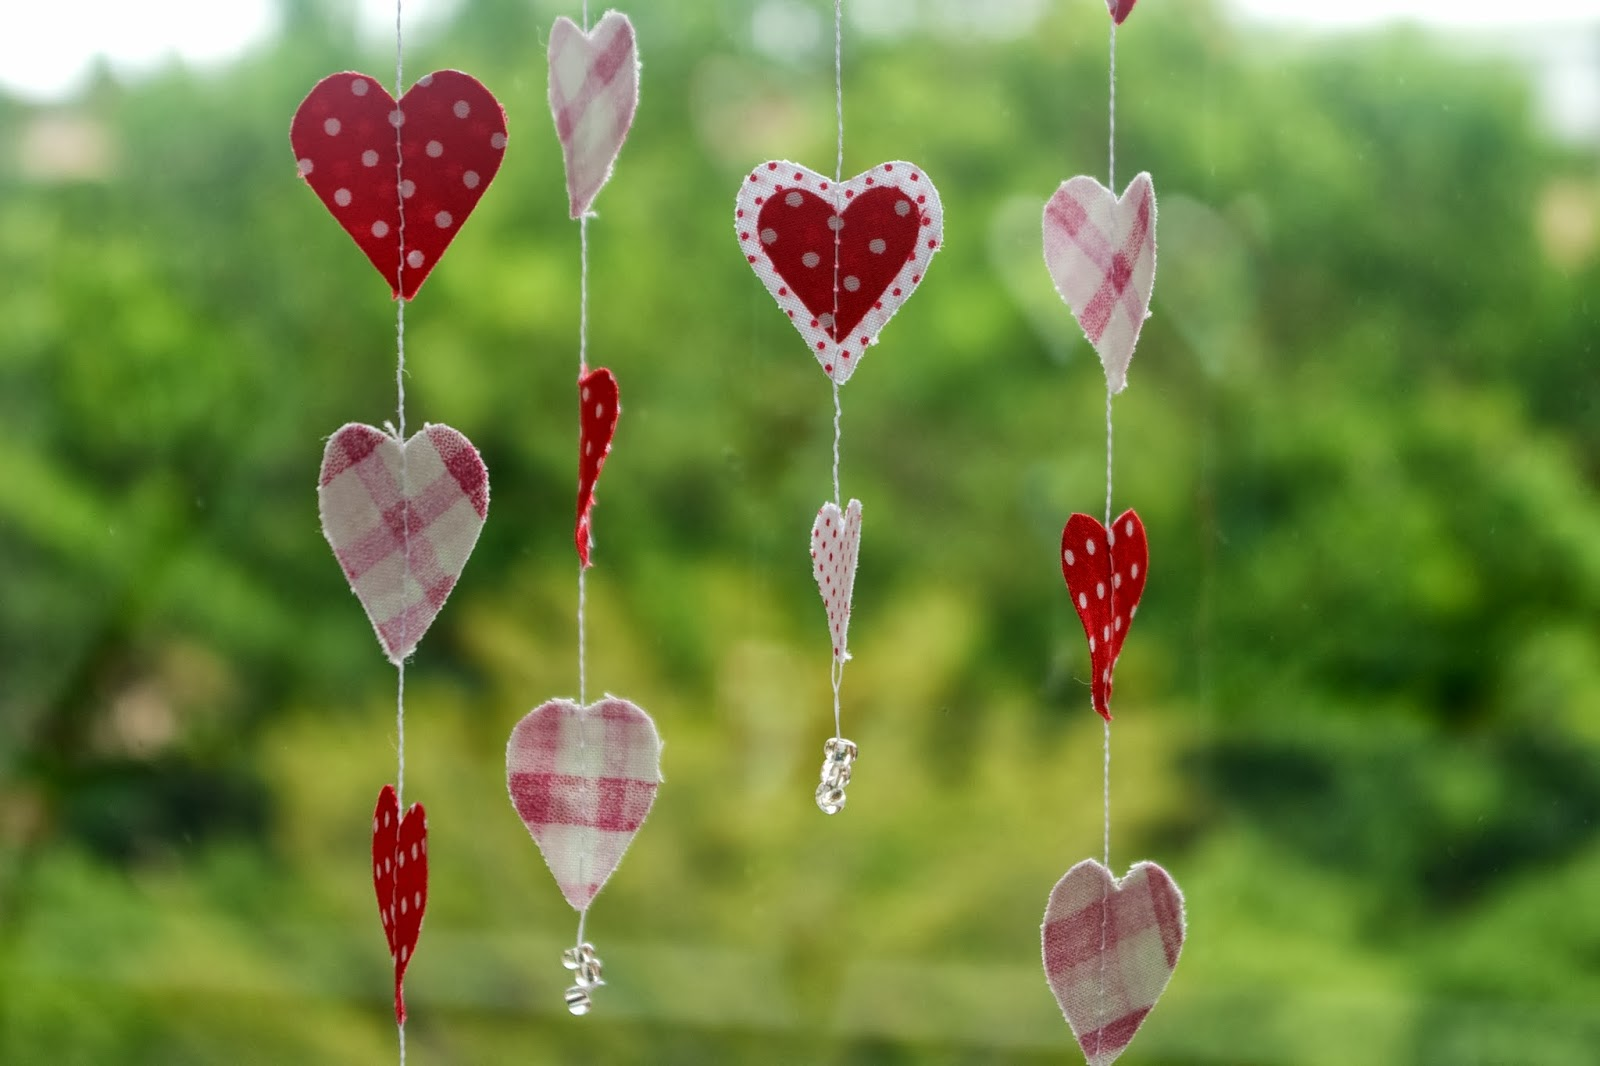 http://stitchingnotes.blogspot.com/2014/01/tutorial-fabric-hearts-garland.html